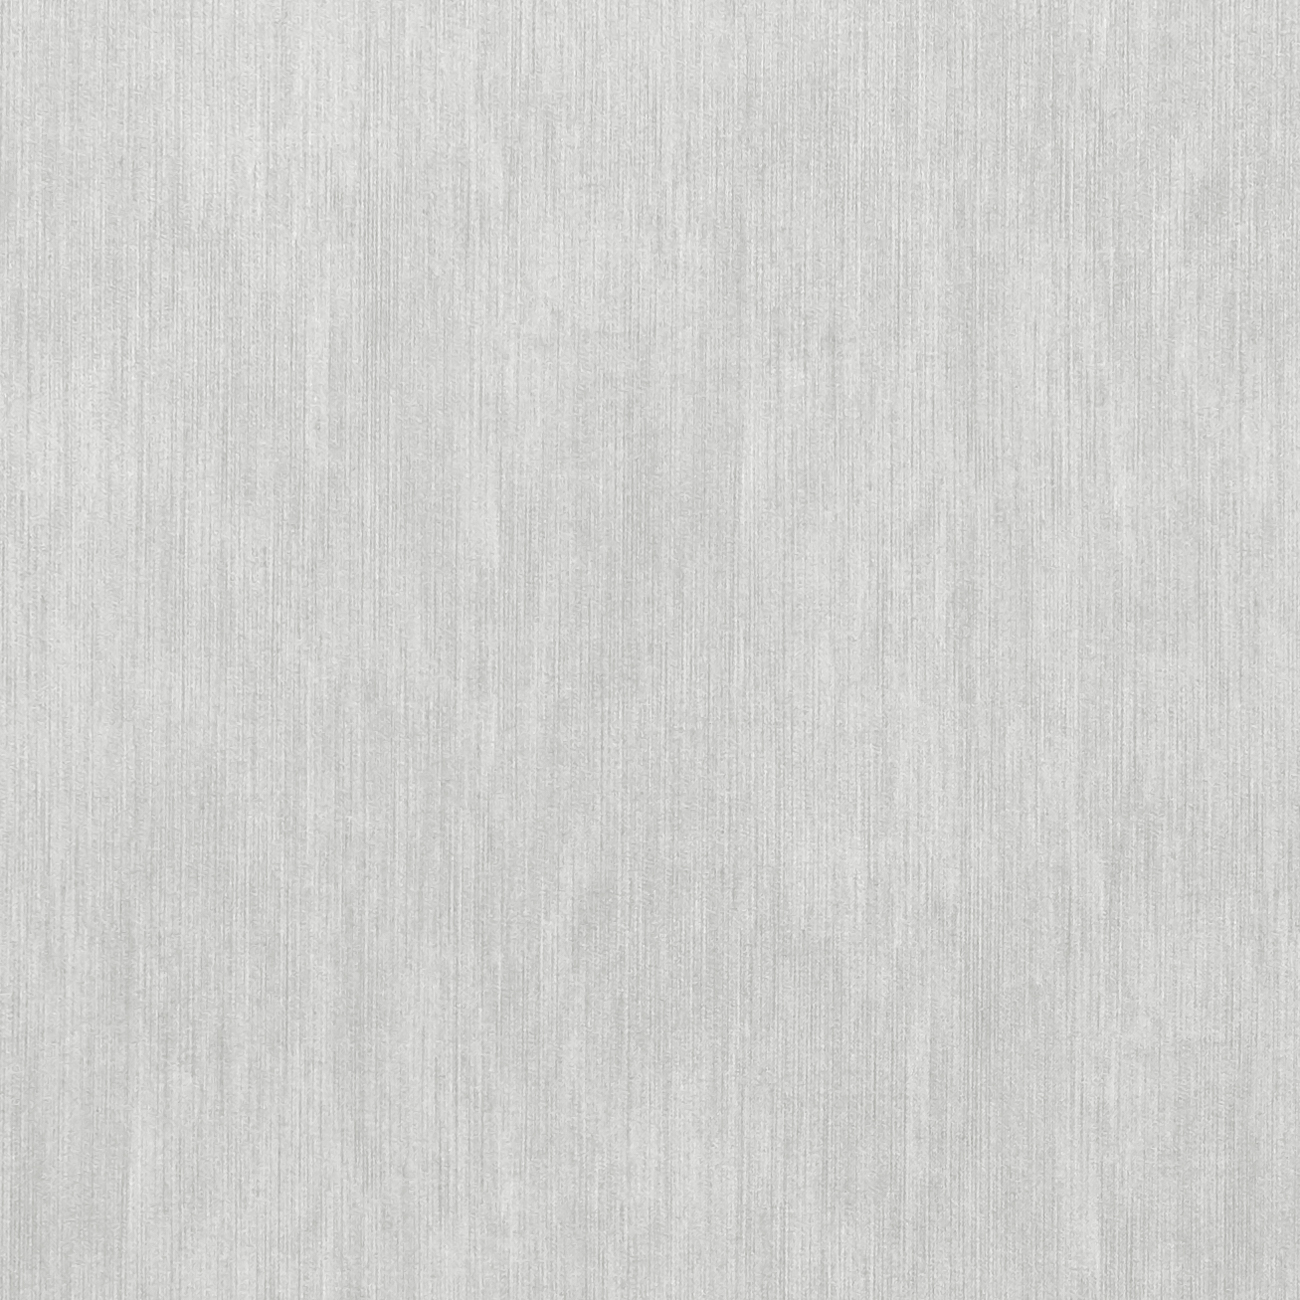 METALLICA F1200/19 | CLARKE & CLARKE